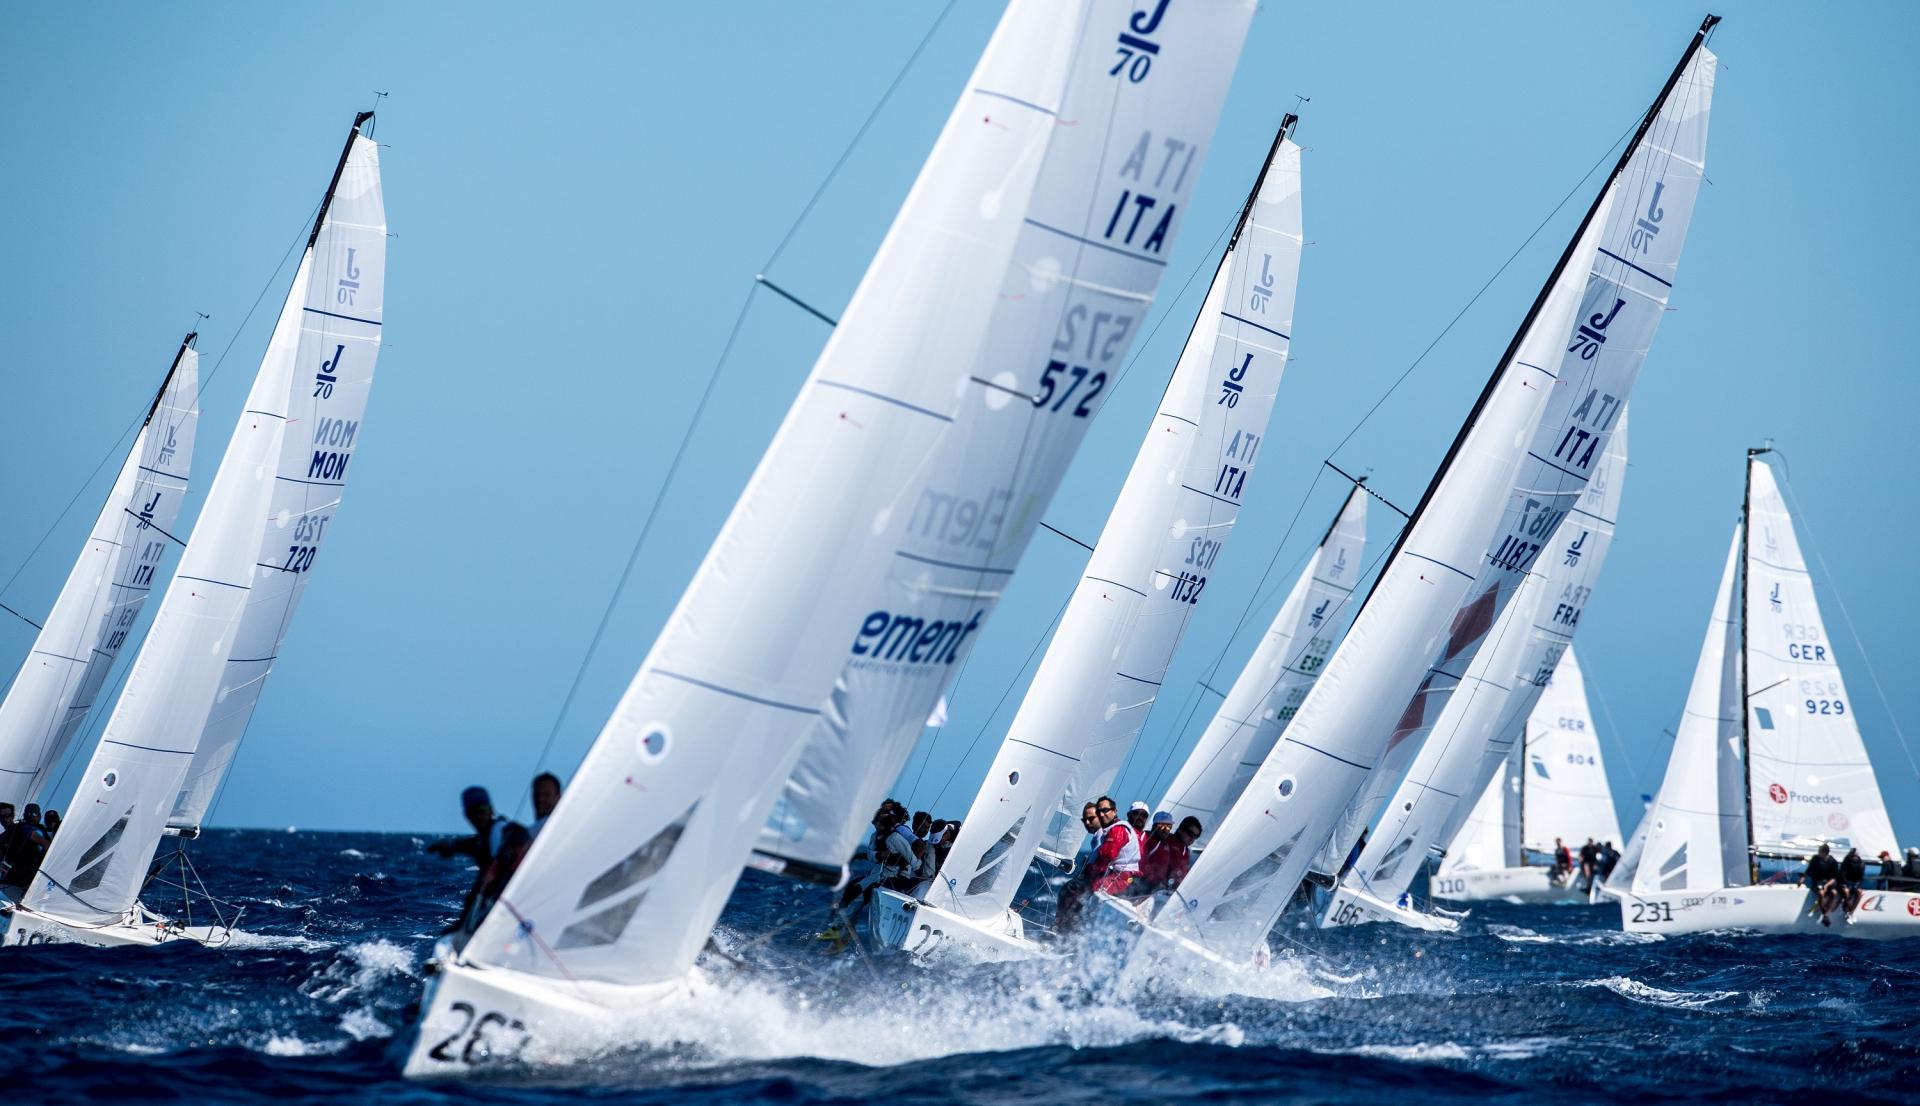 Audi J/70 World Championship - Highlights video online - NEWS - Yacht Club Costa Smeralda